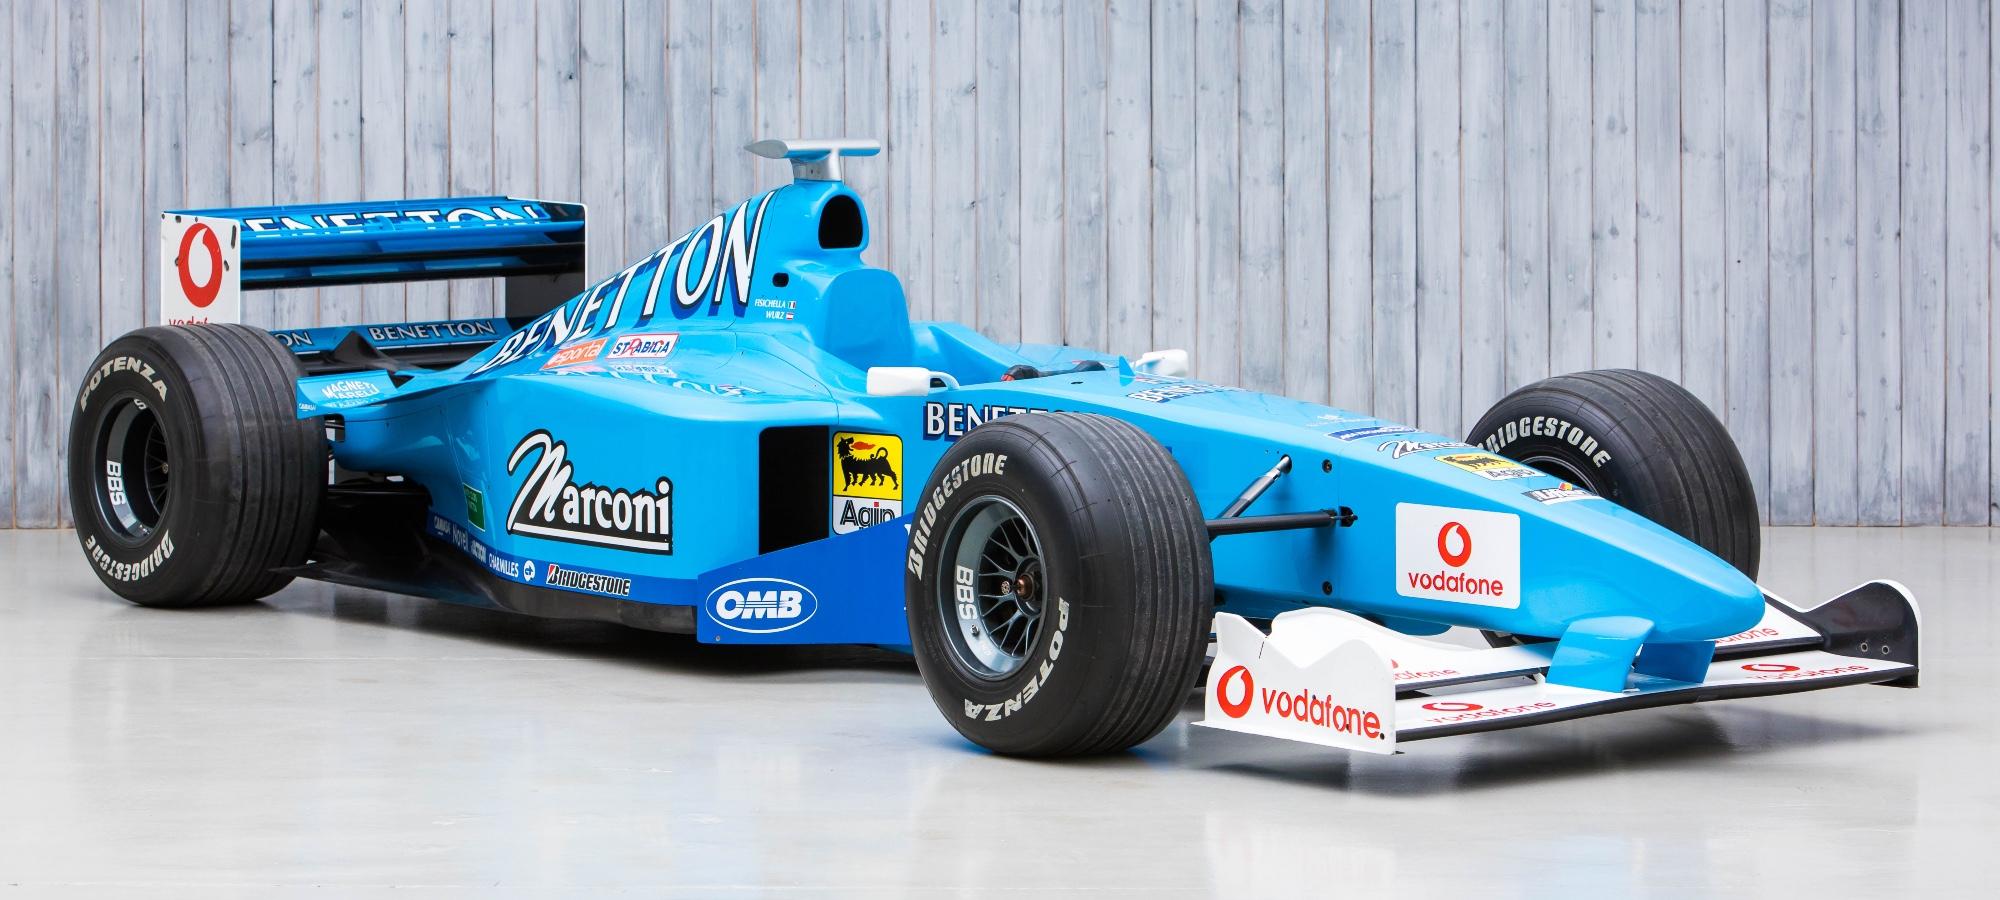 The Ex - Giancarlo Fisichella 2000 Benetton B200 Formula 1